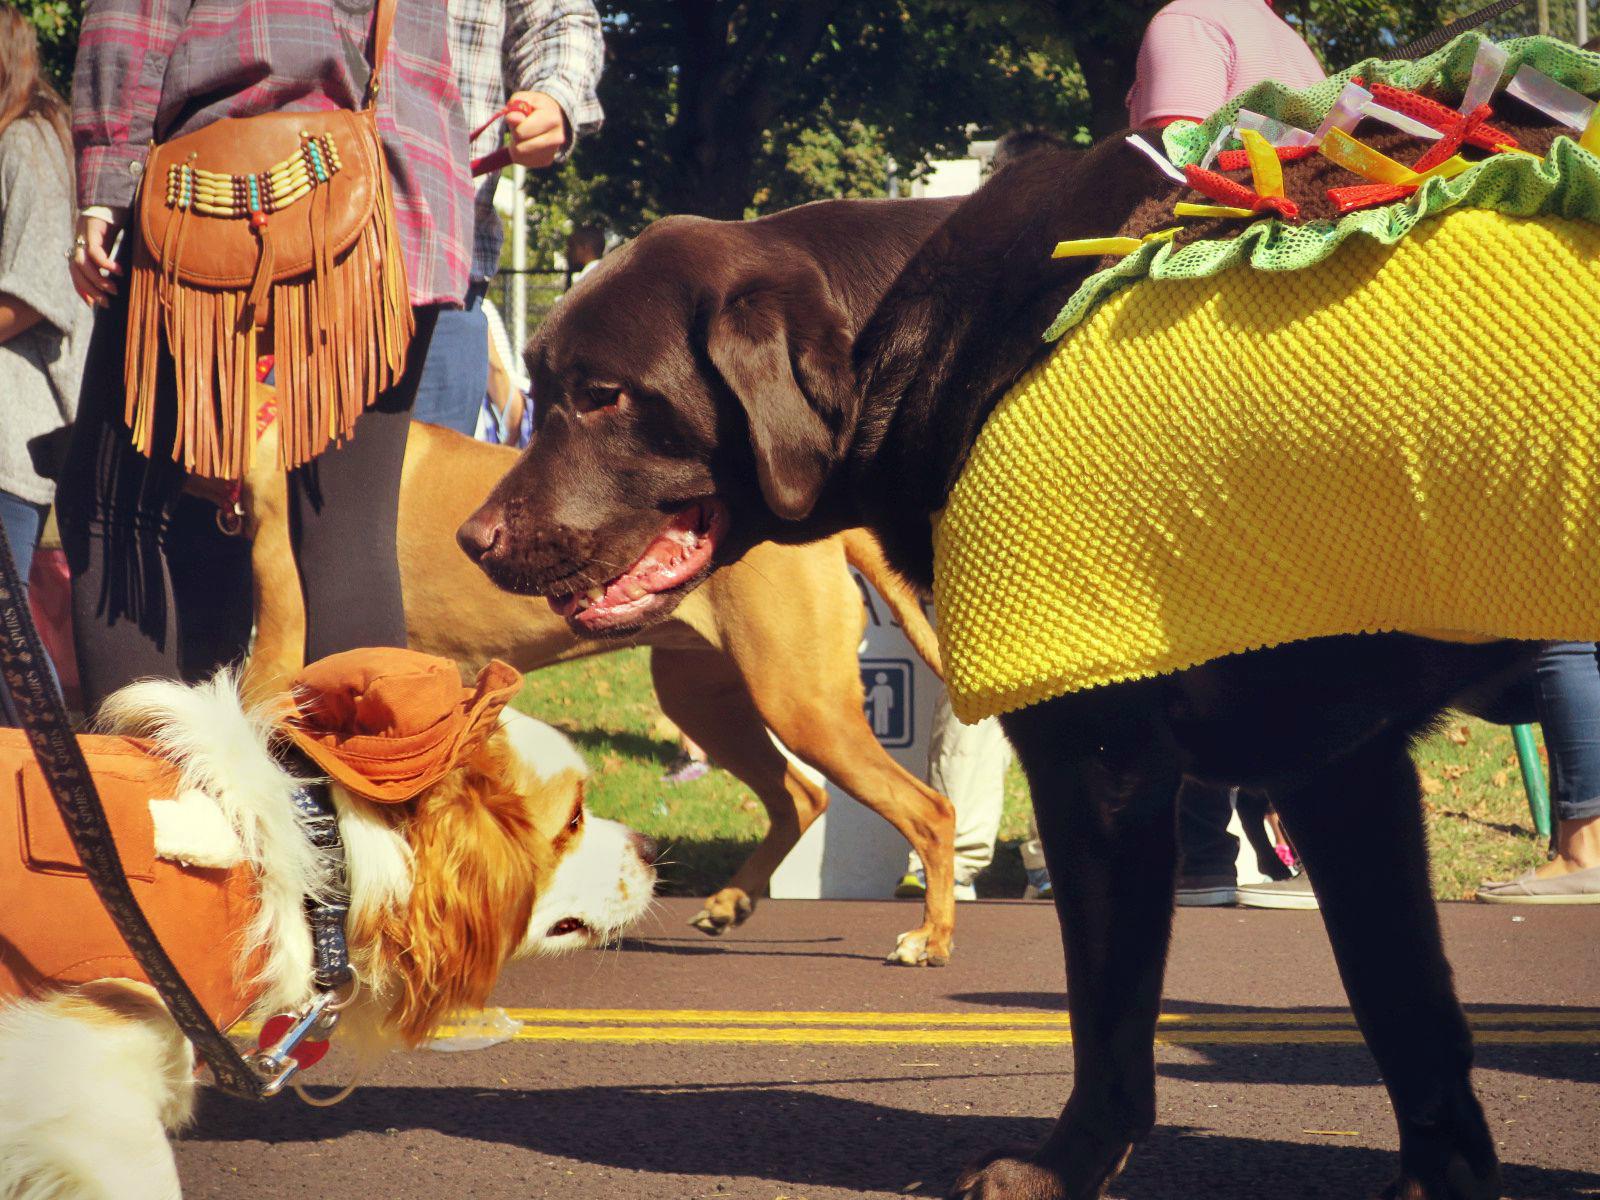 eastfallslocal-10-15-bc-costume-hot-dog-cow-boy